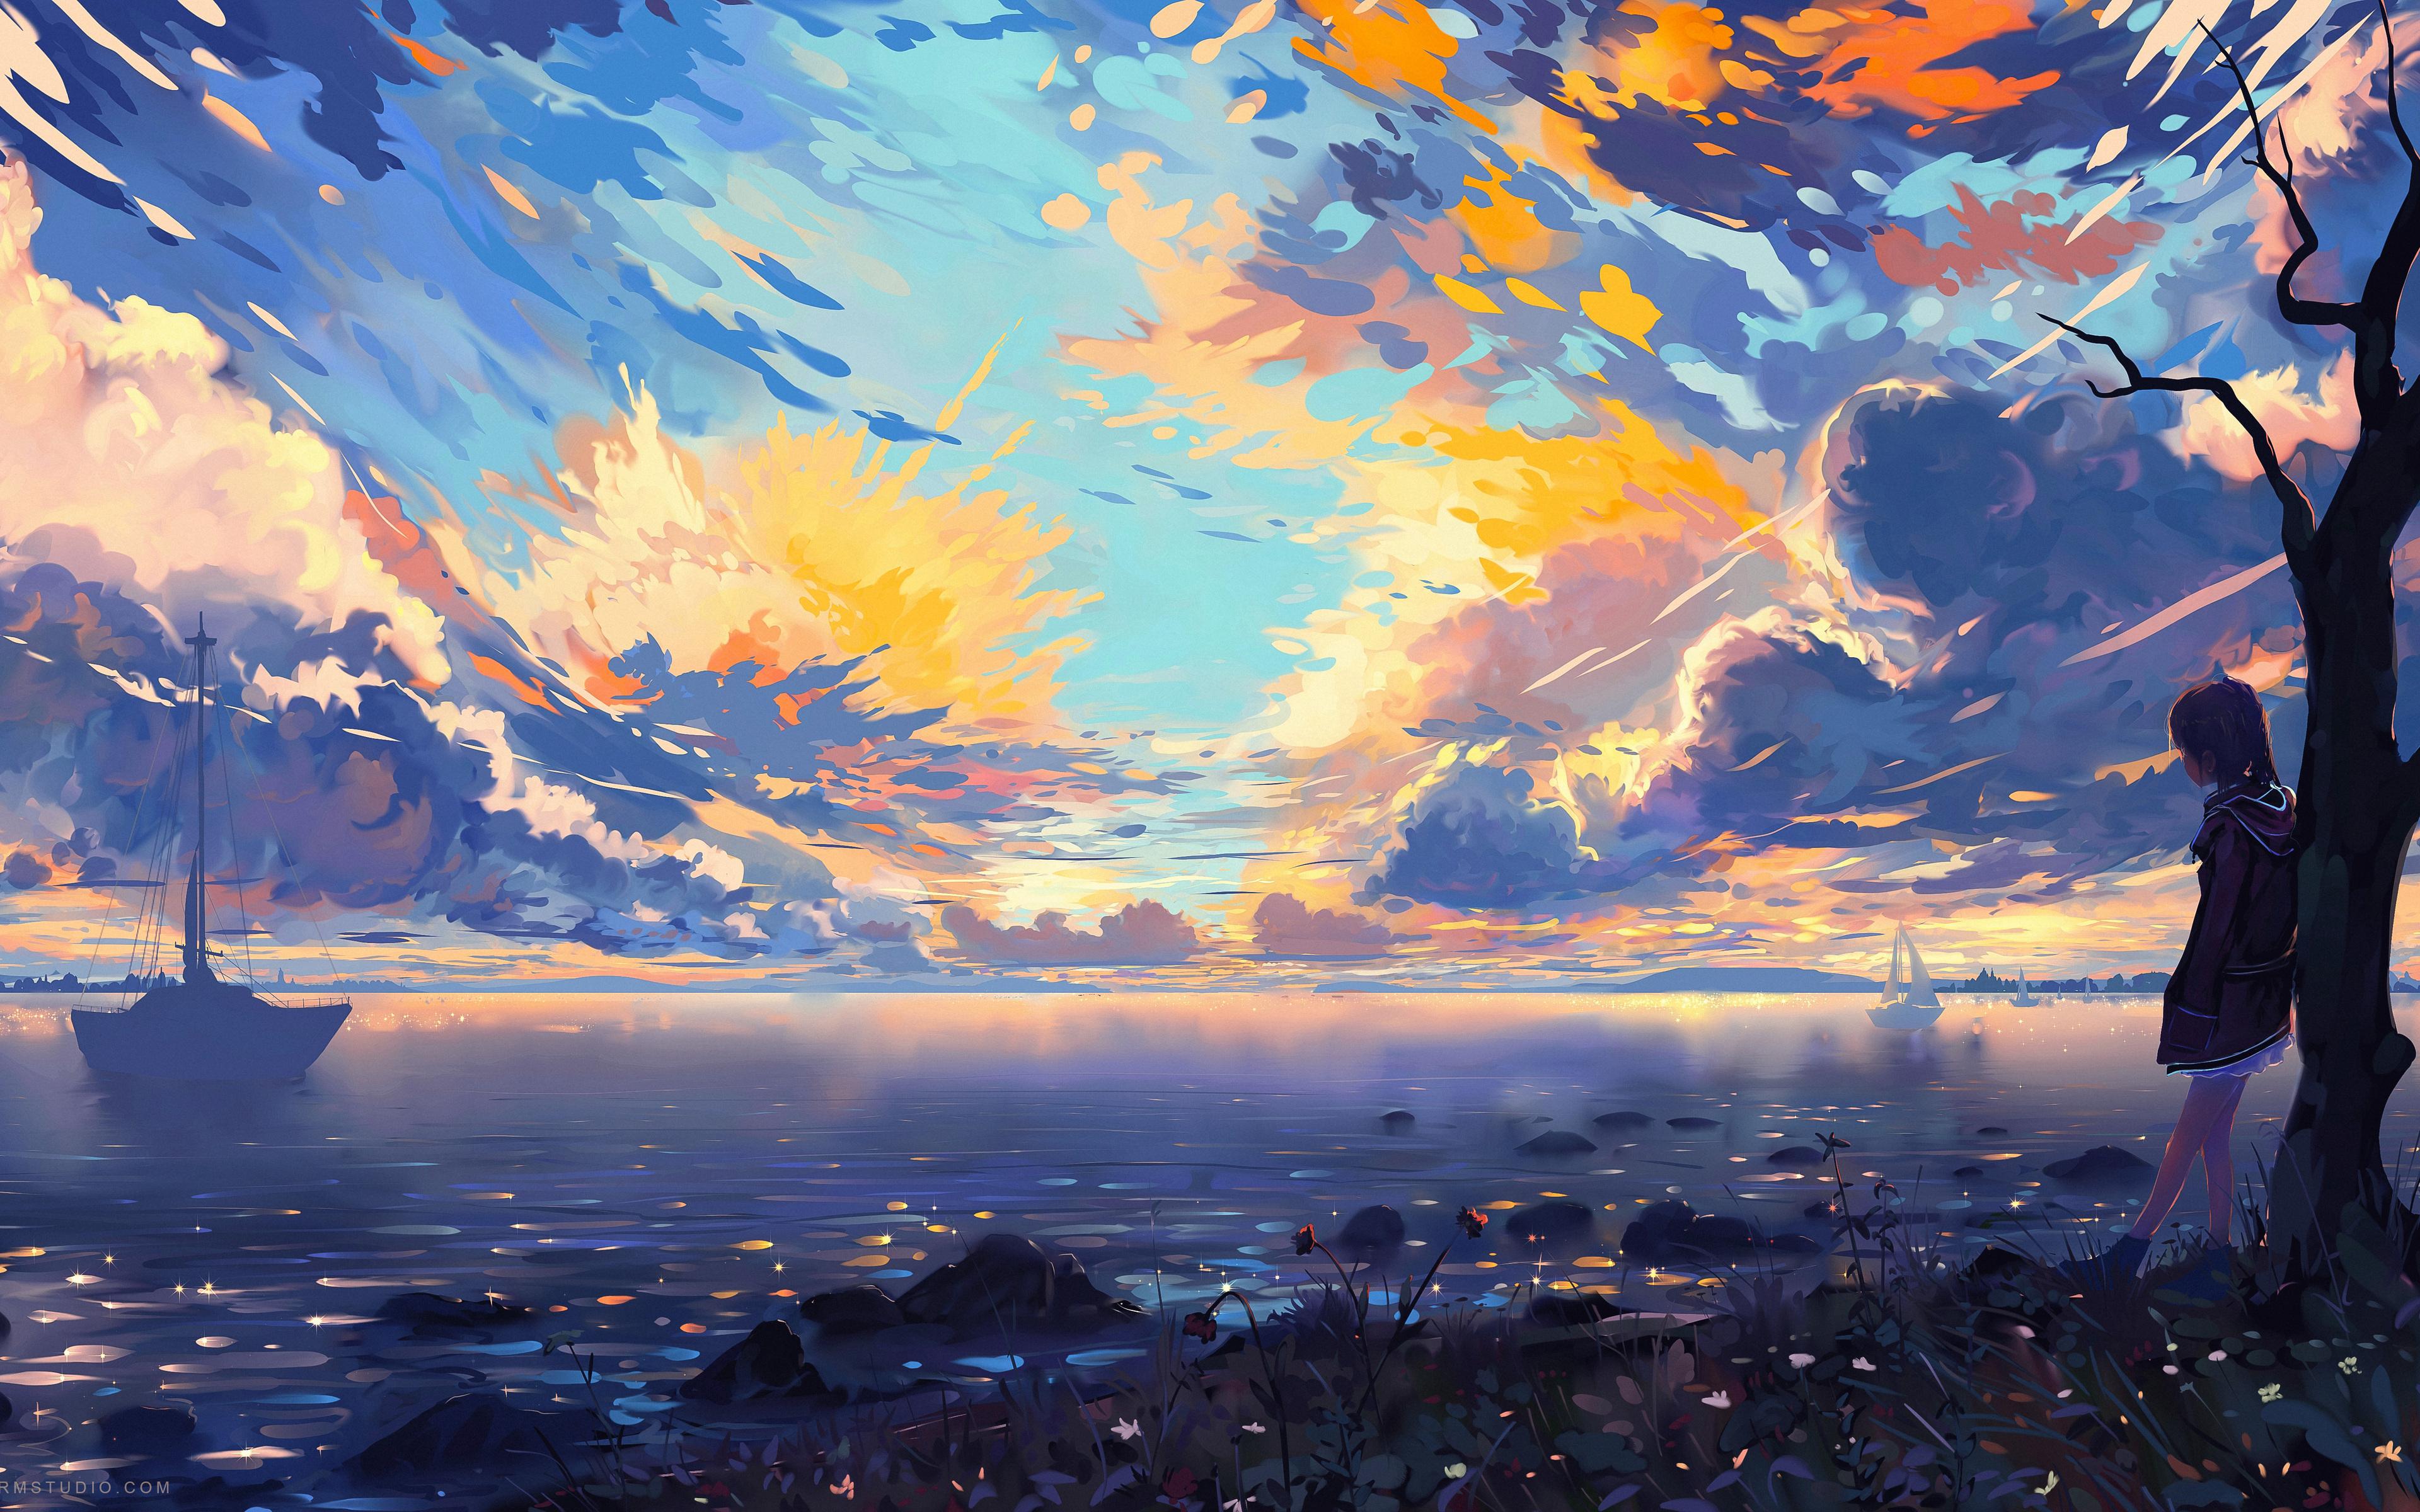 my-secret-alone-time-sea-shore-clouds-silence-digital-art-4k-5l.jpg